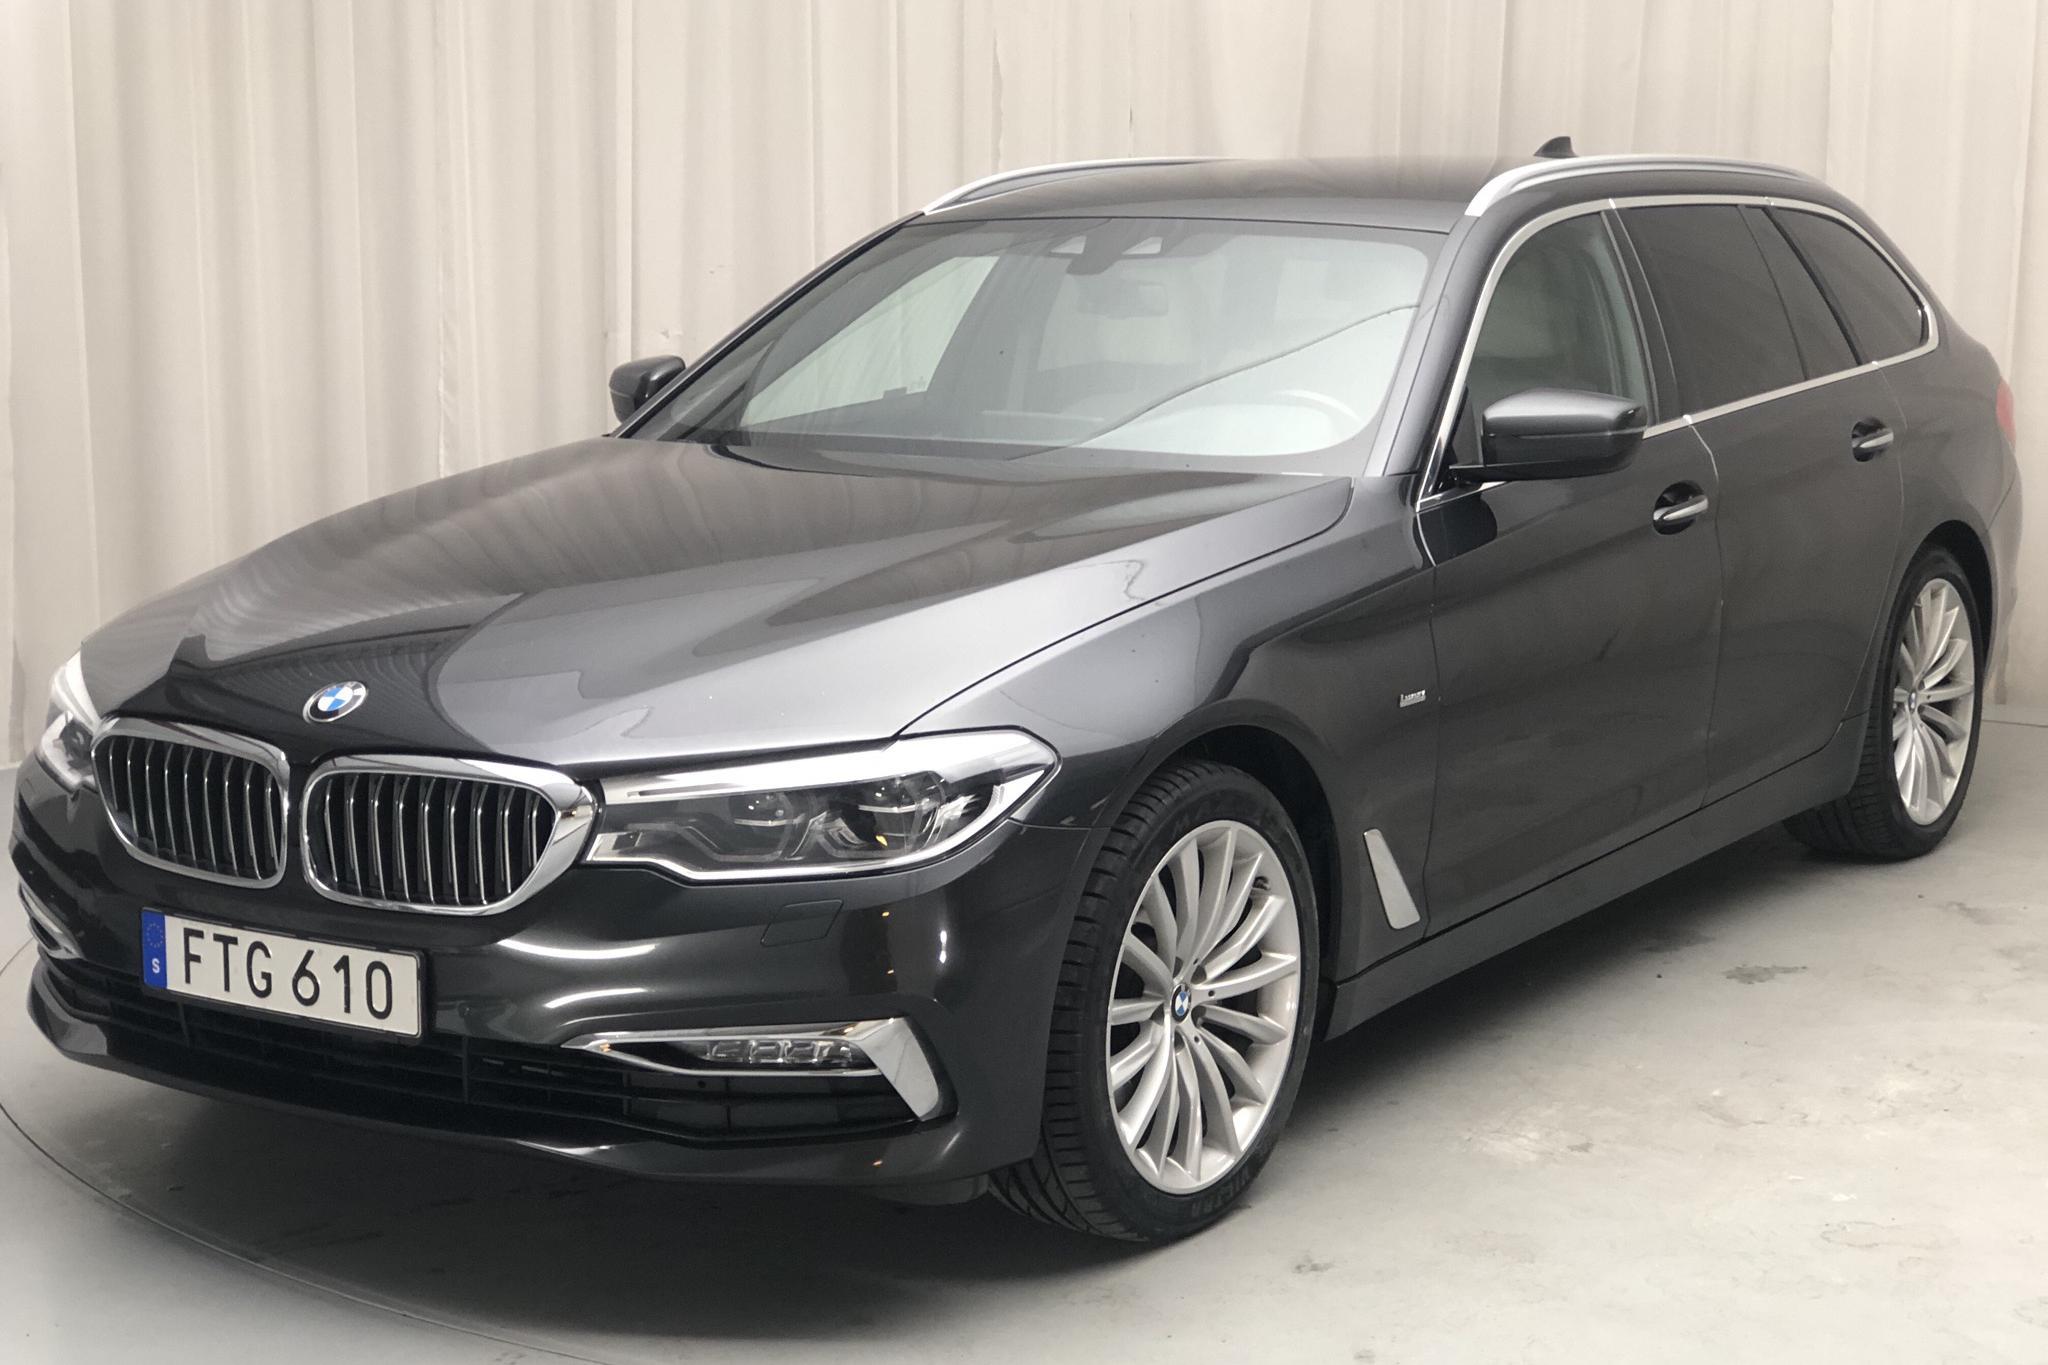 BMW 520d Touring, G31 (190hk) - 11 125 mil - Automat - grå - 2018